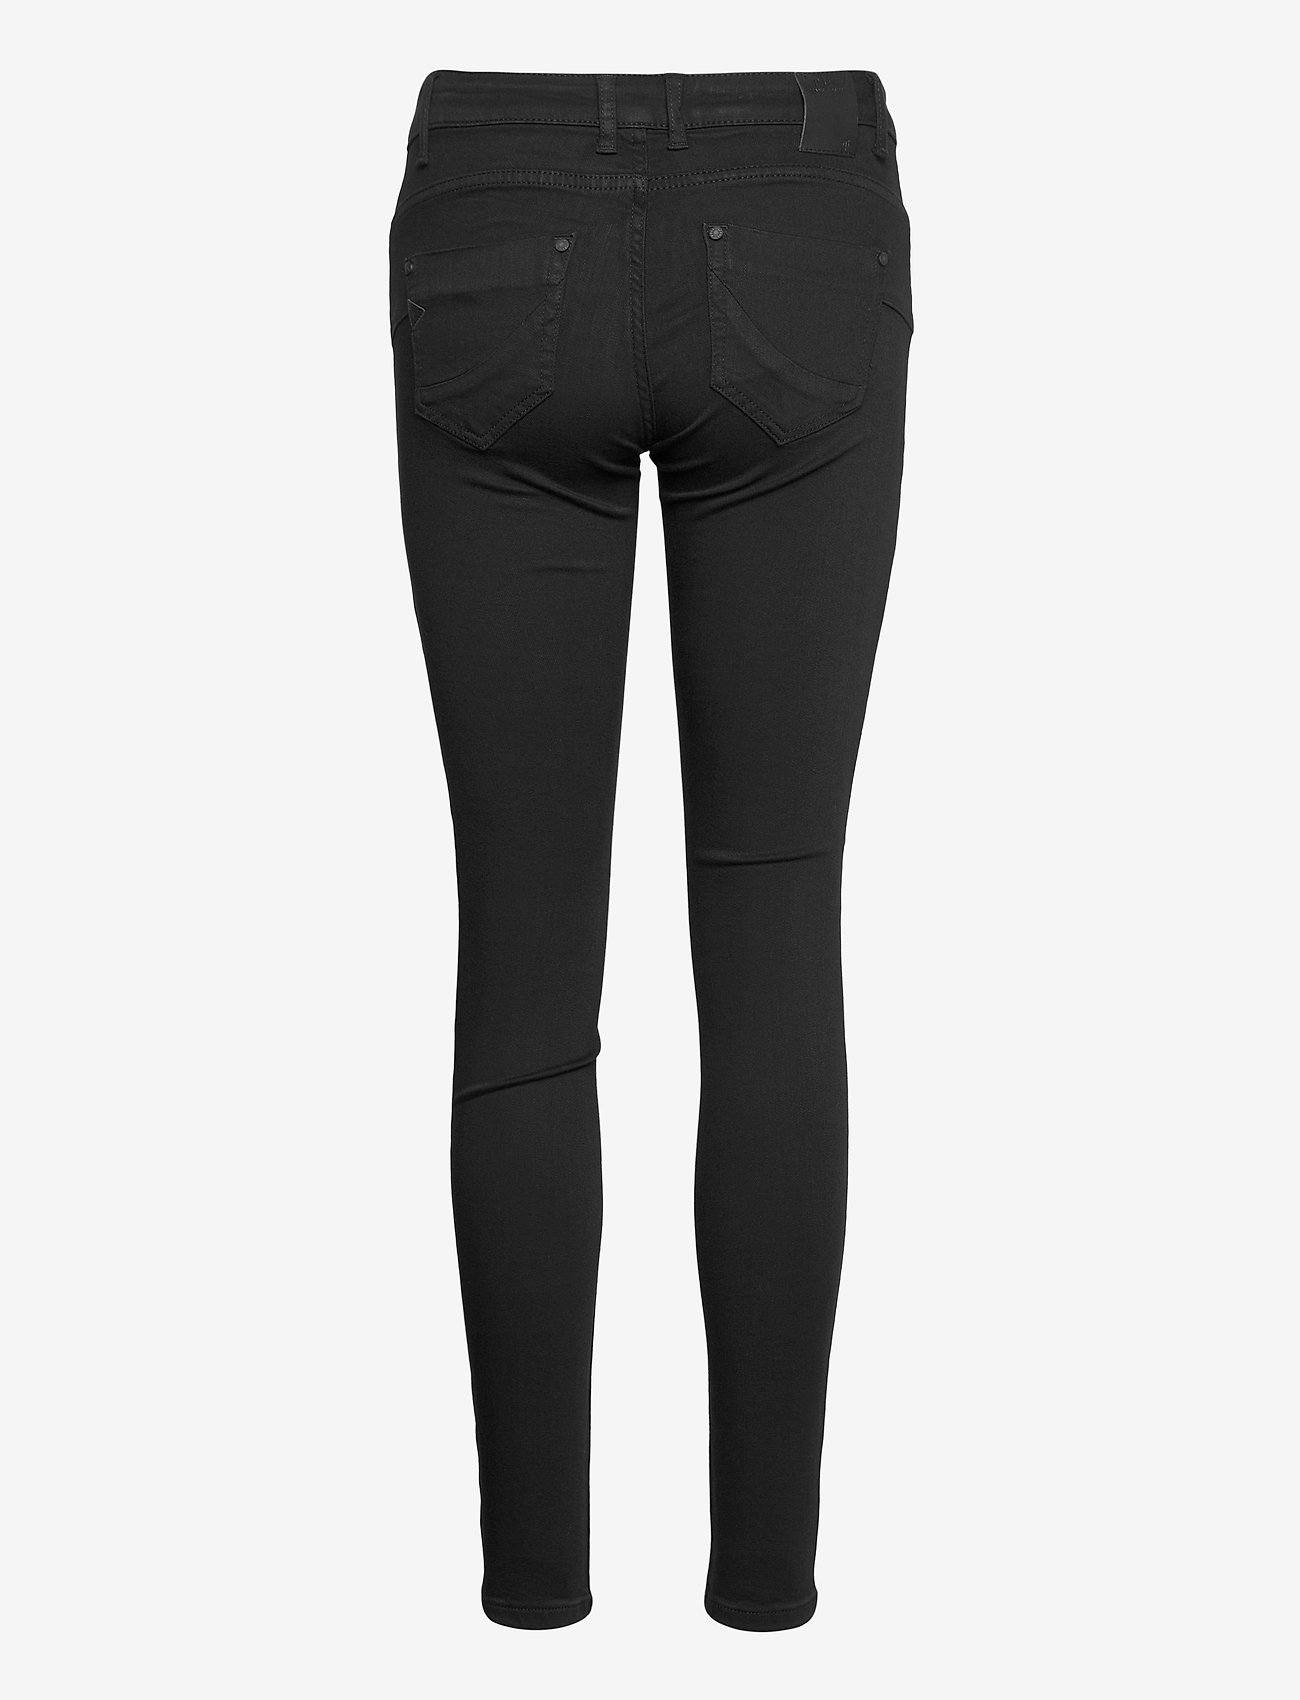 Pulz Jeans - PZANNA Jeans Skinny Leg Stay Black - skinny jeans - black denim - 1